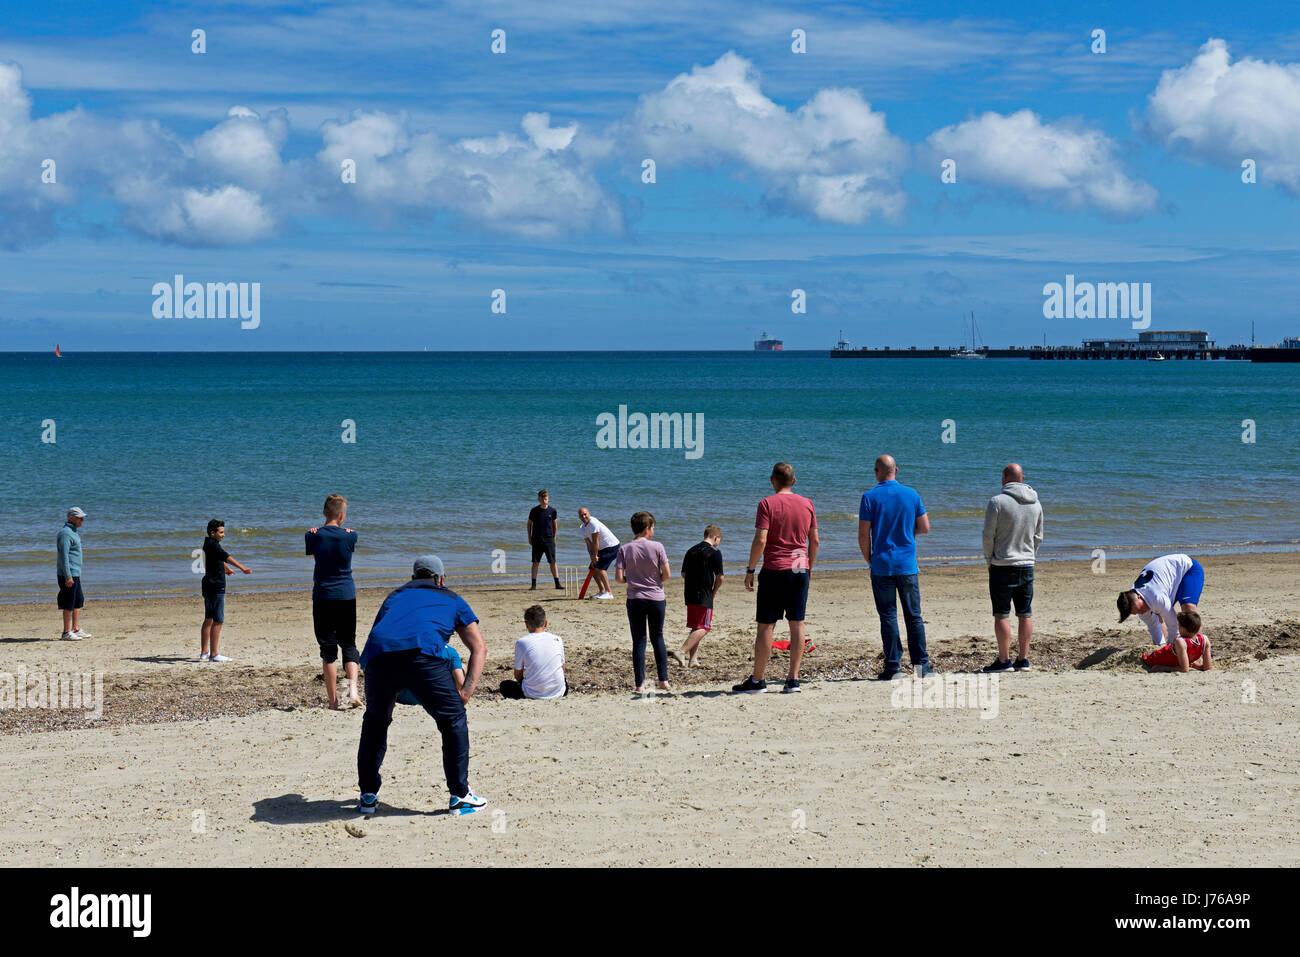 Cricket on the beach, Weymouth, Dorset, England UK - Stock Image